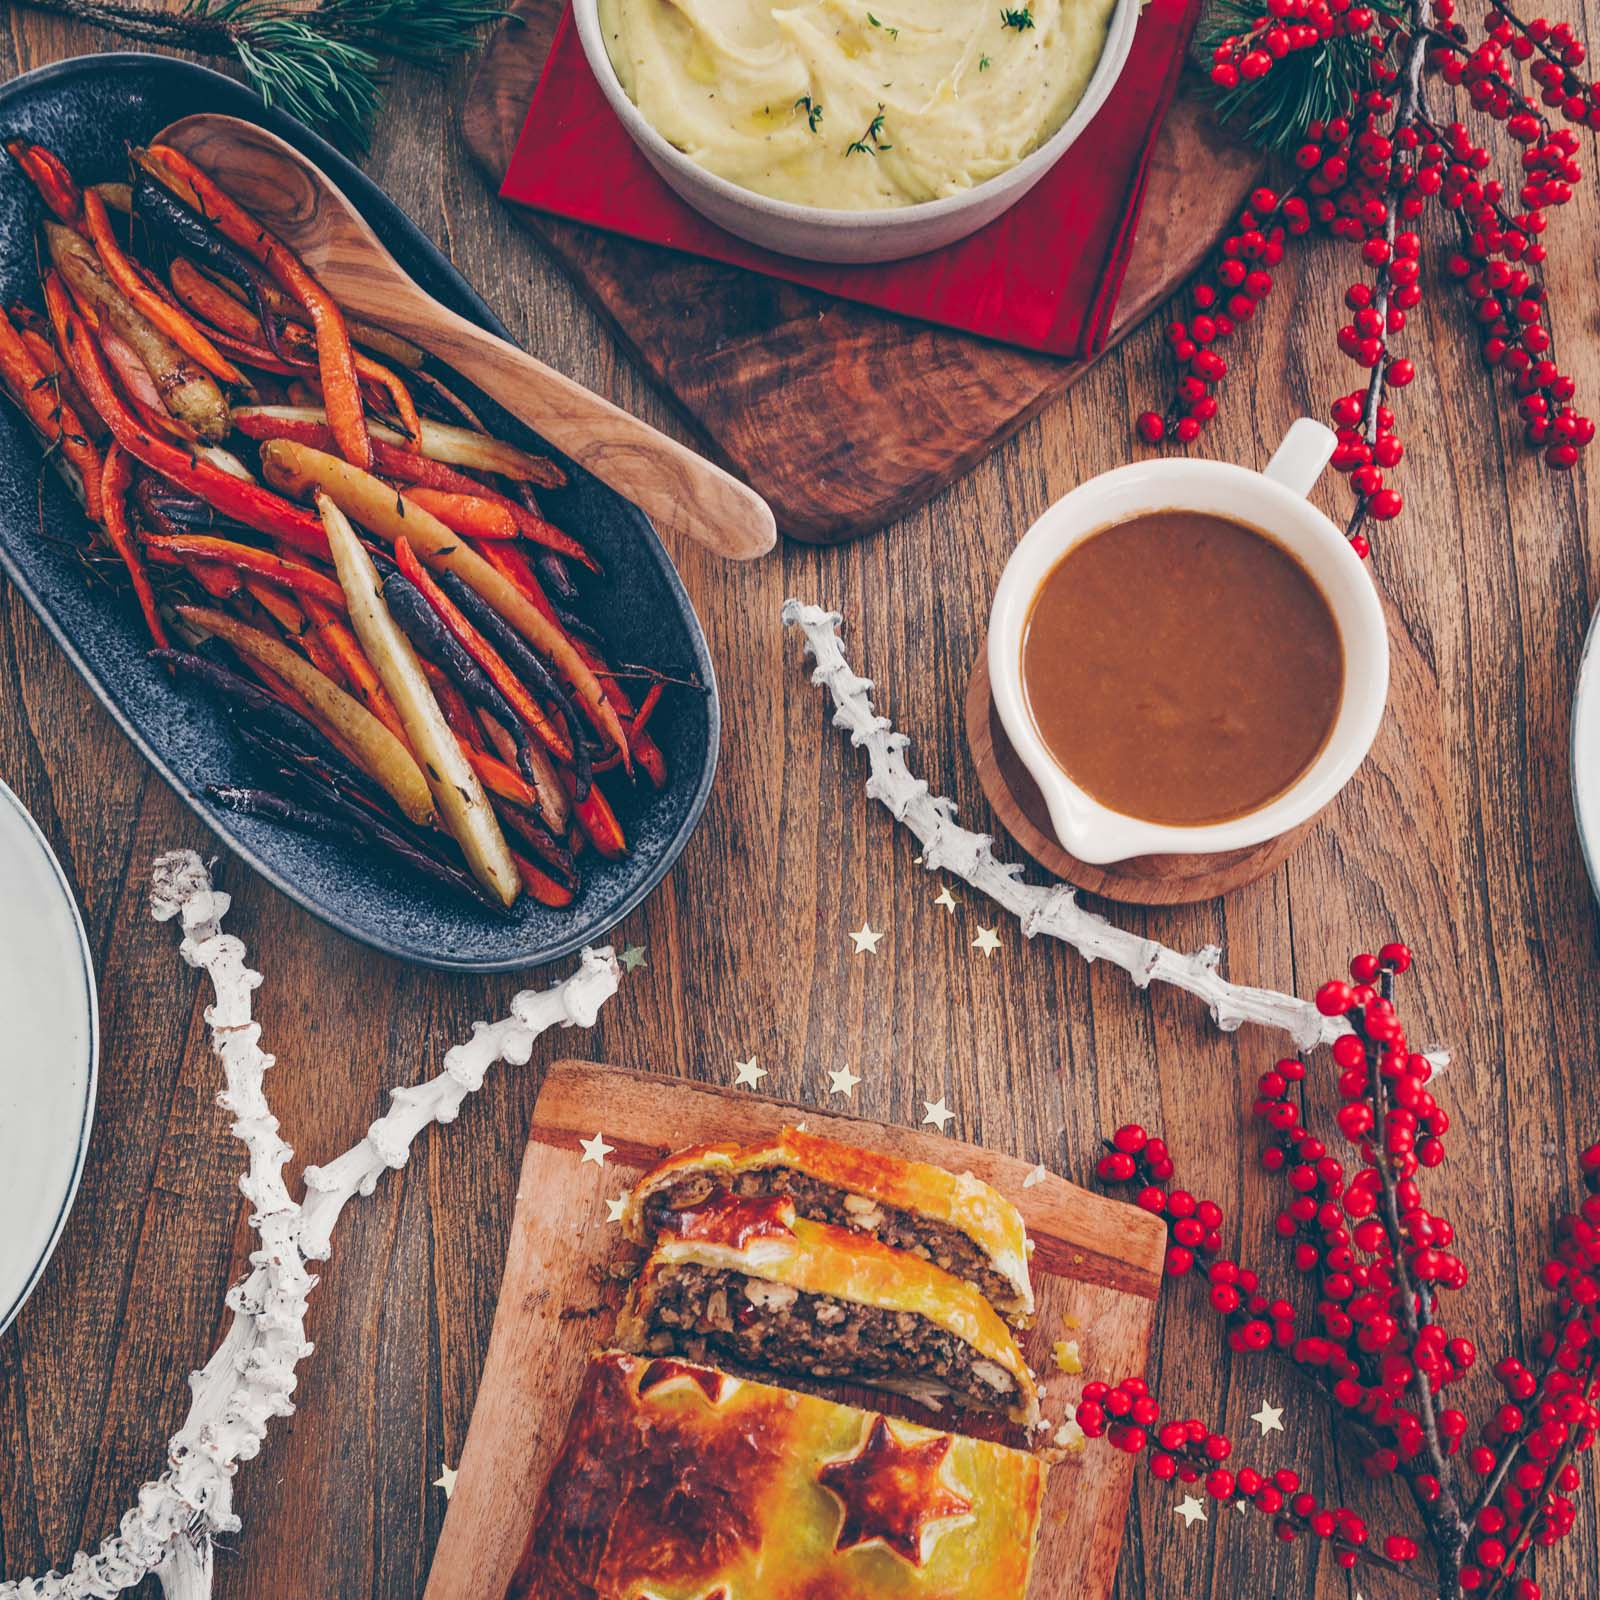 Veganes Weihnachtsmenü: Trüffeltofu-Pilz-Maroni-Strudel